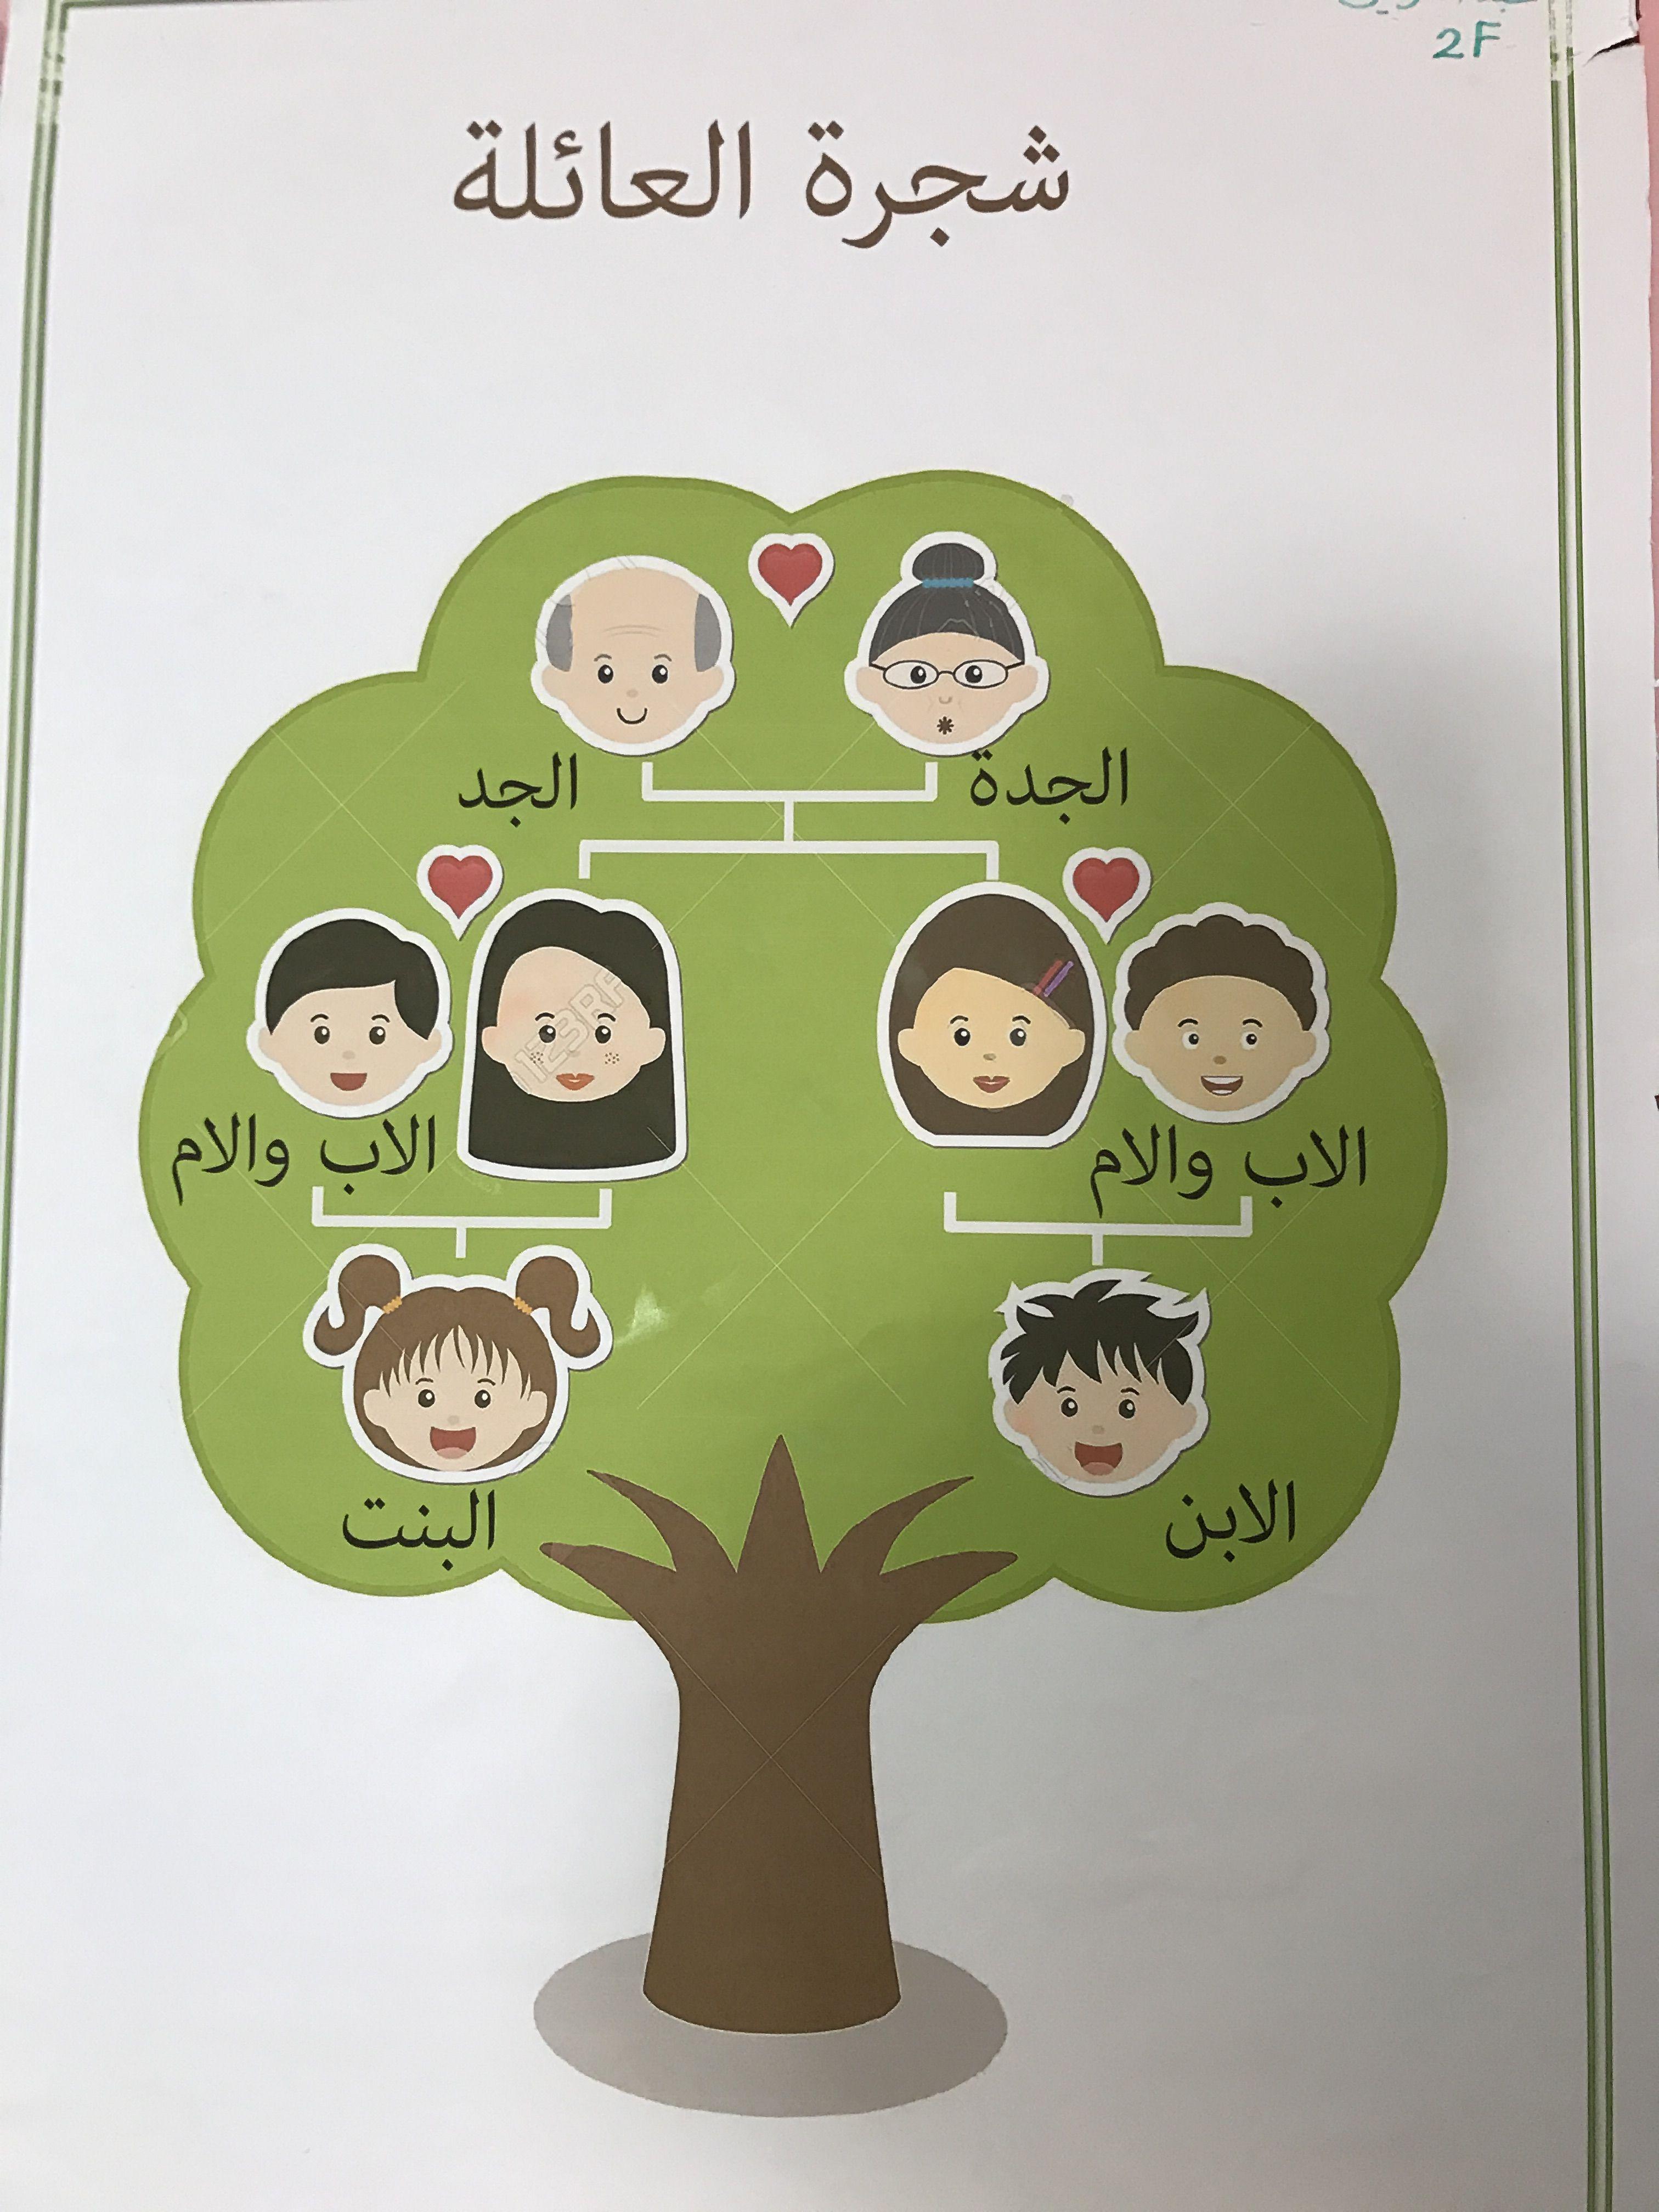 Family Tree شجره العائله School Art Activities Superhero Classroom Theme Preschool Classroom Decor